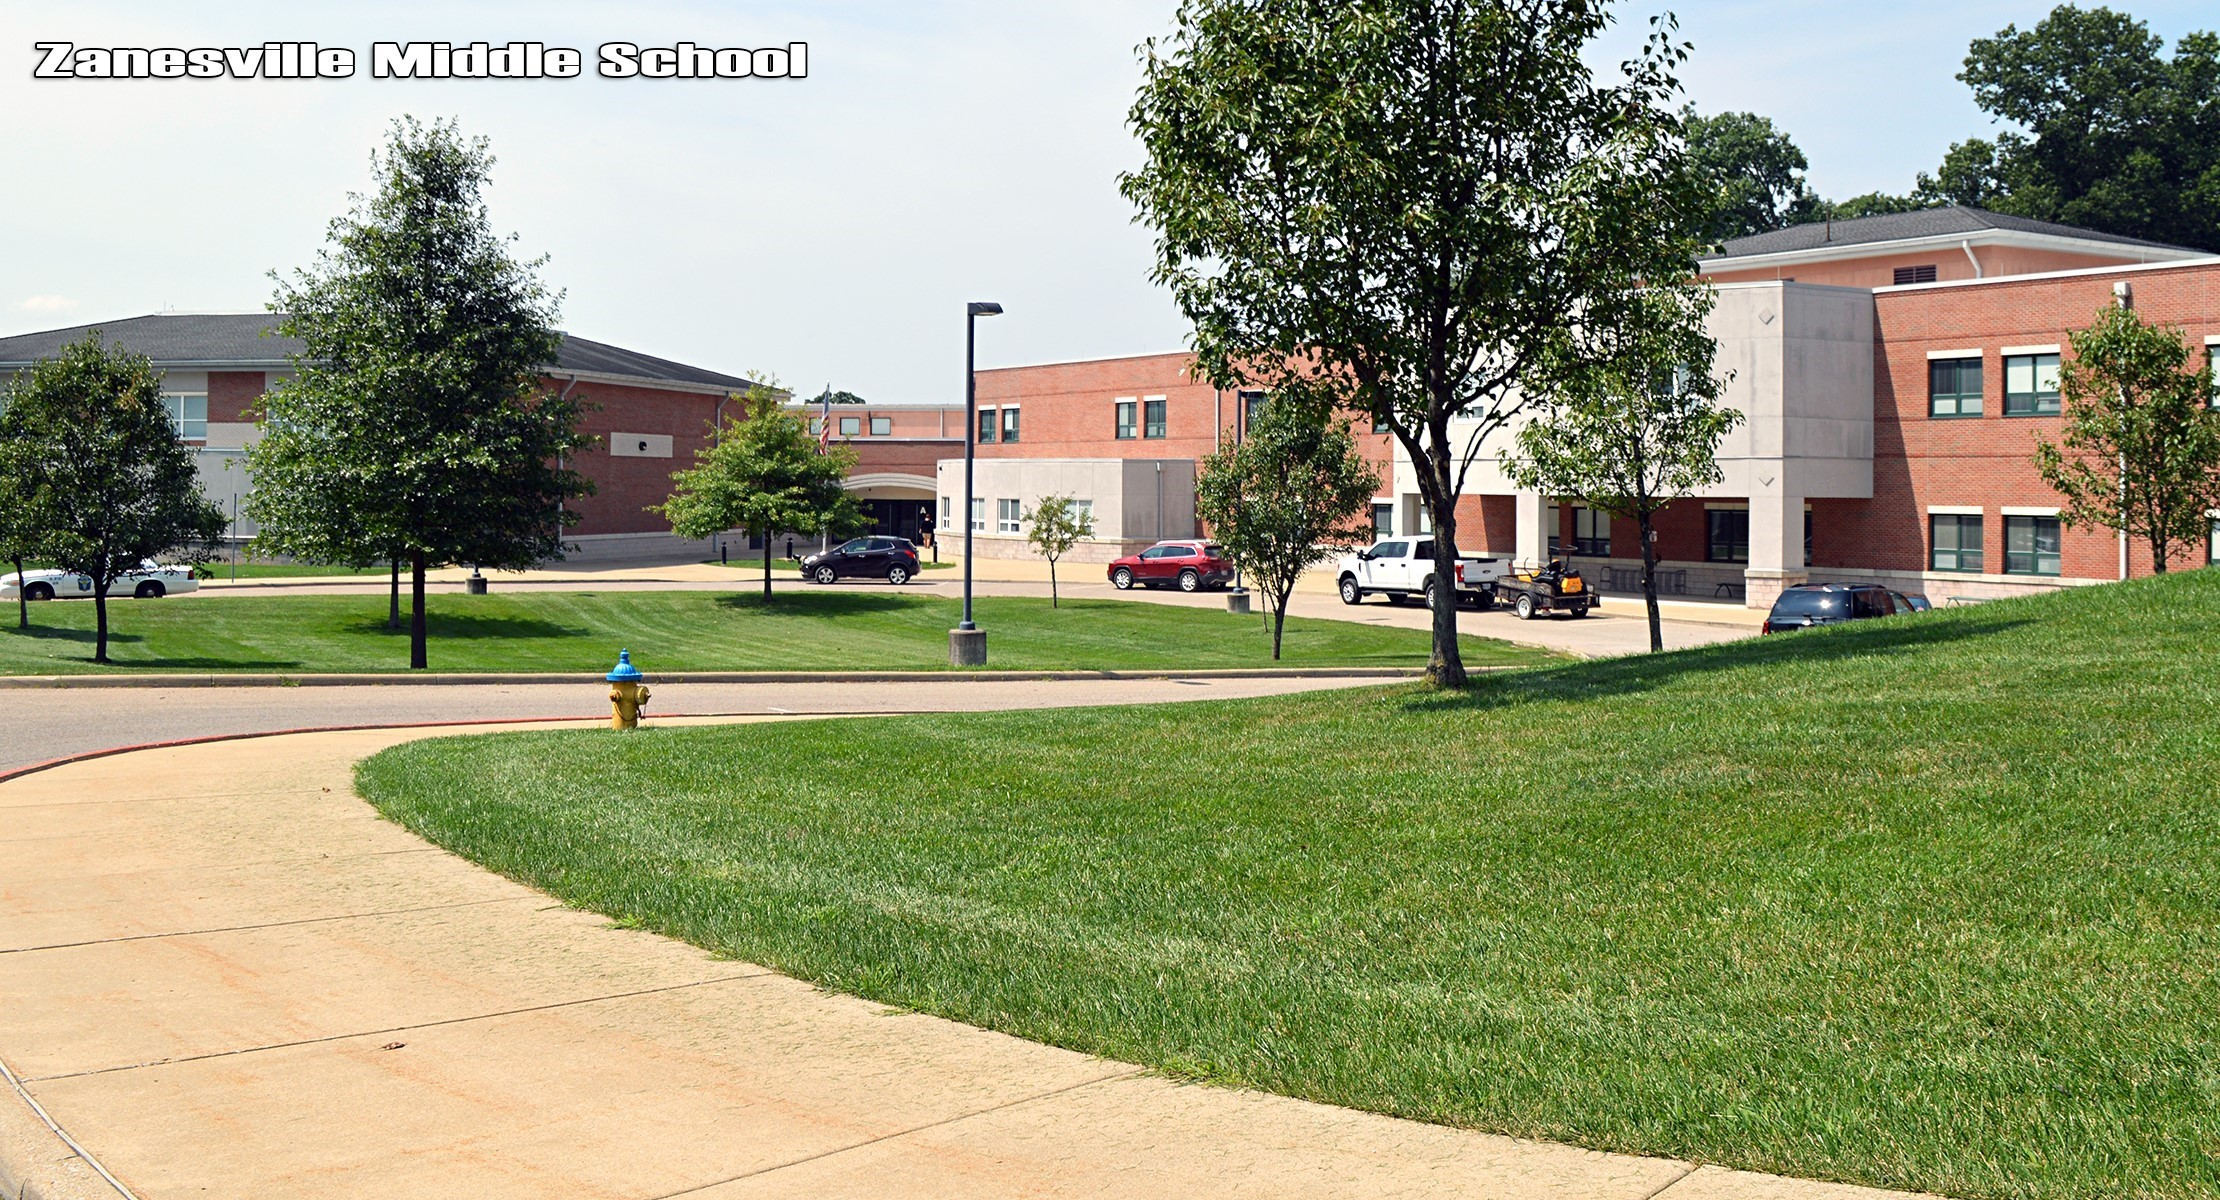 Zanesville Middle School building